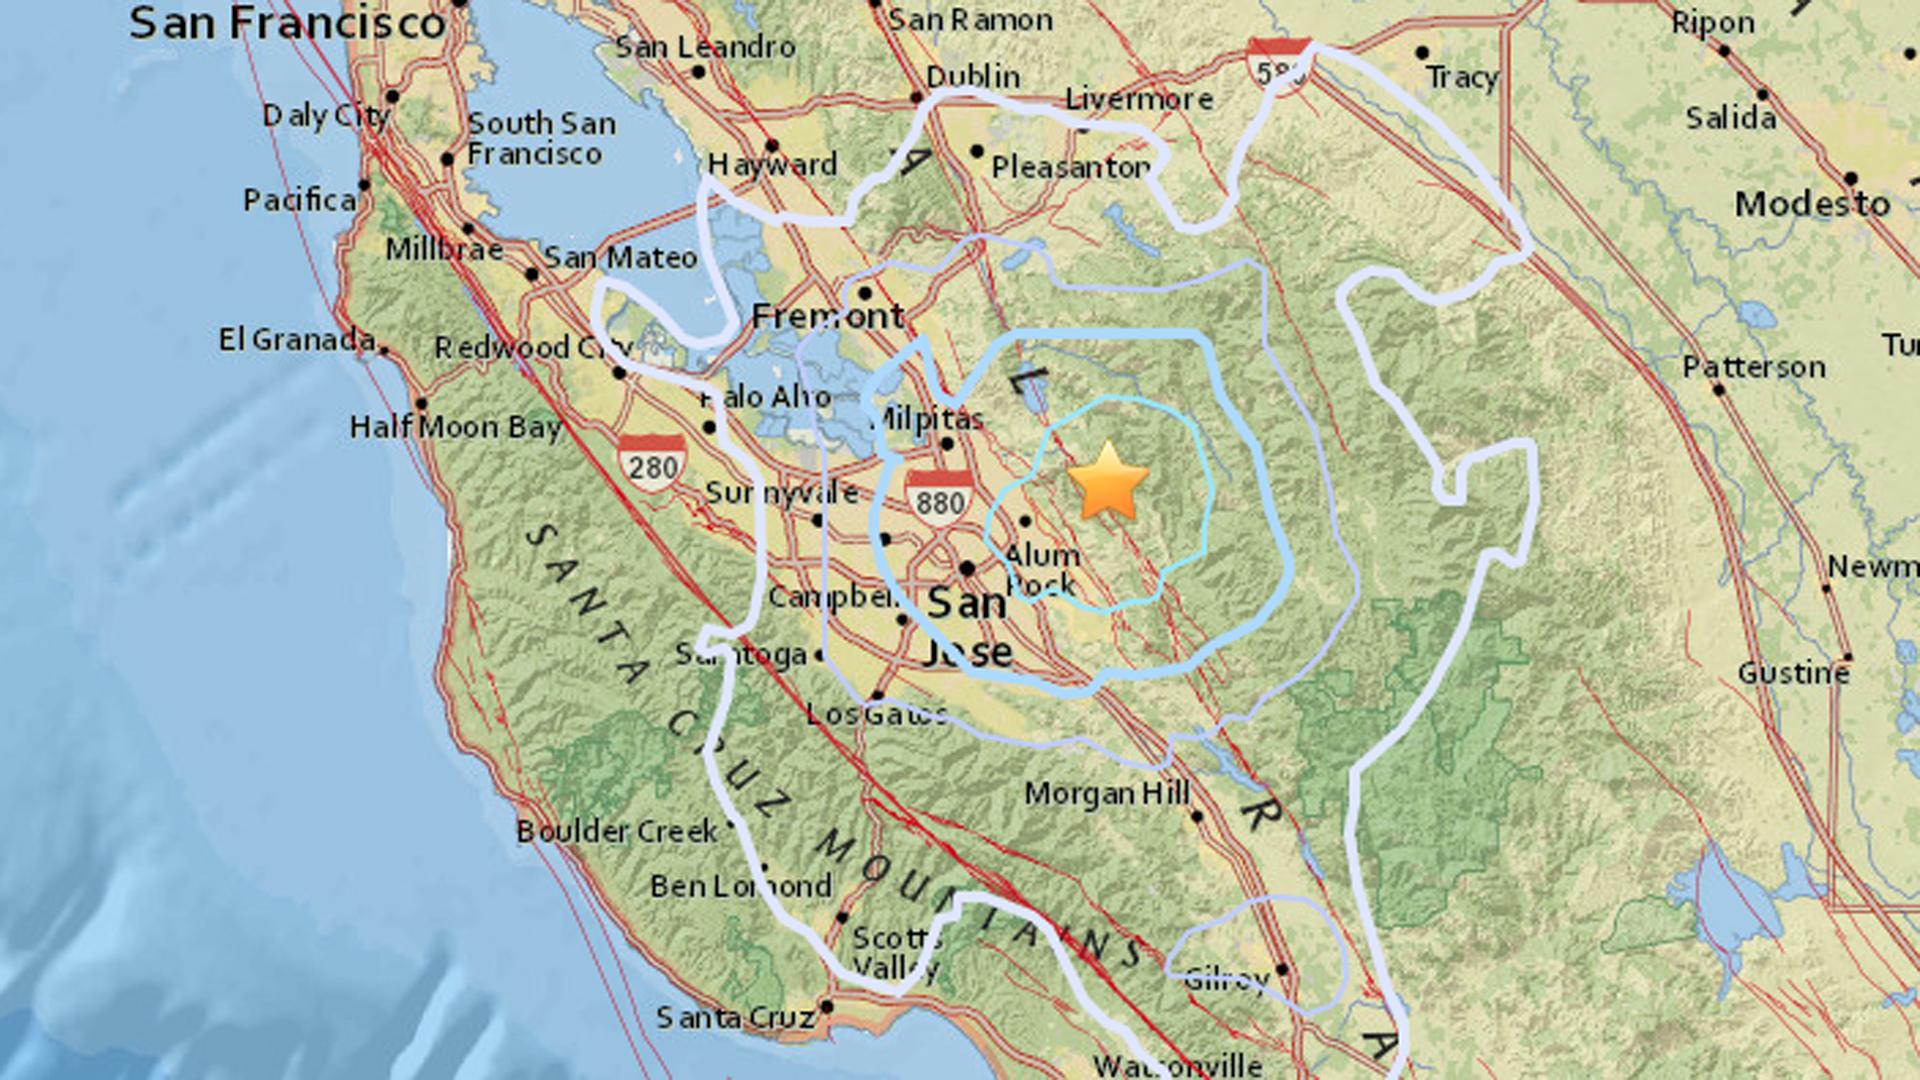 An earthquake struck near San Jose on Dec. 26, 2017. (Credit: USGS)